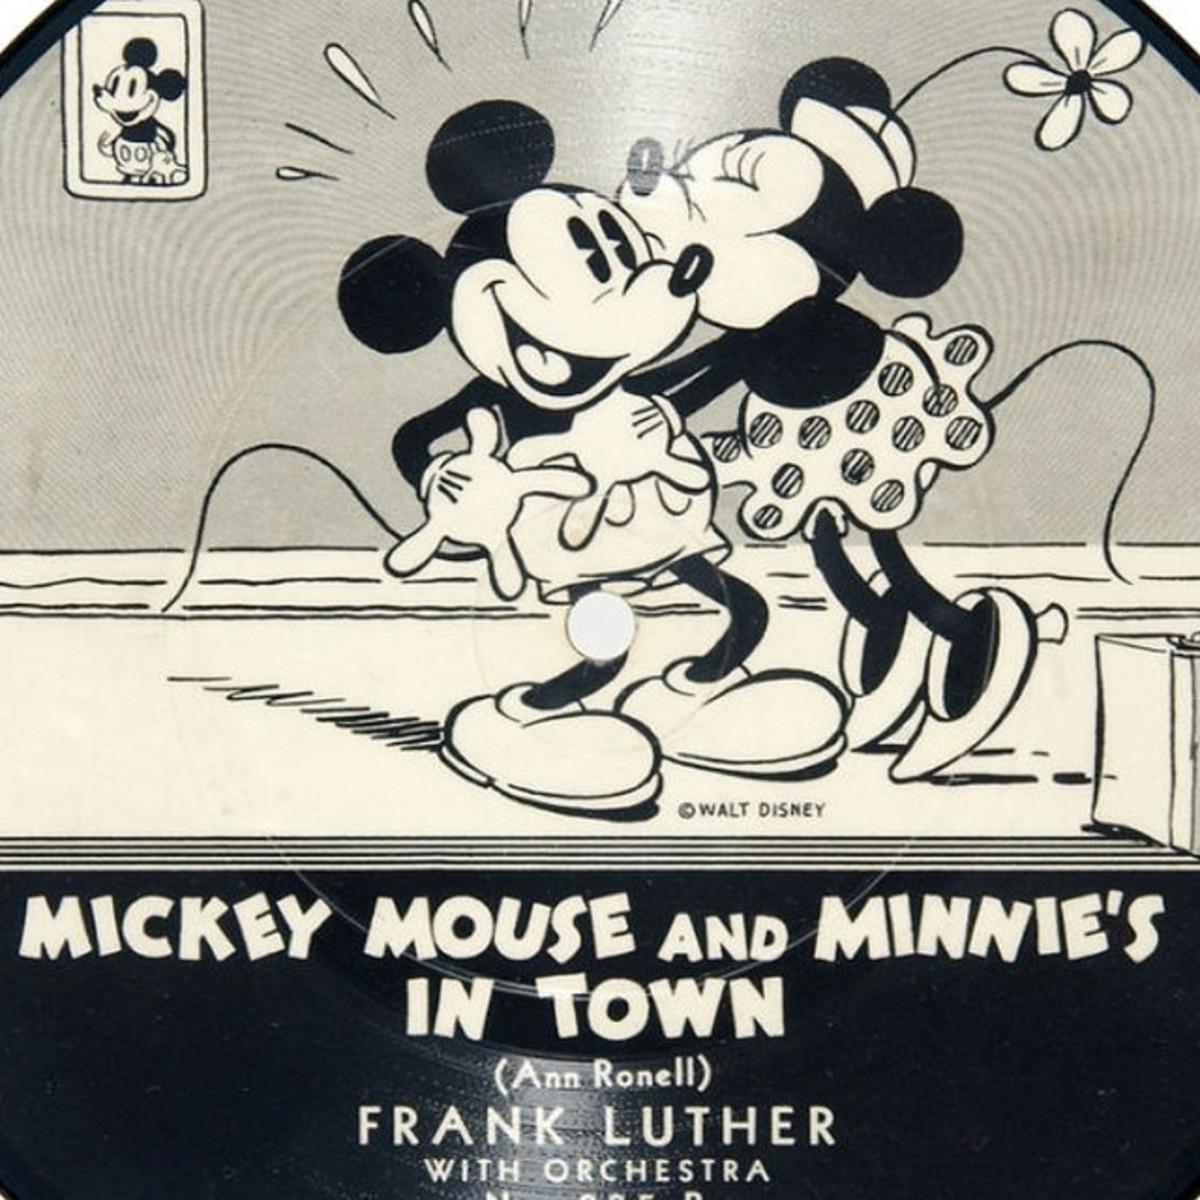 Walt Disney & The Vinyl Record